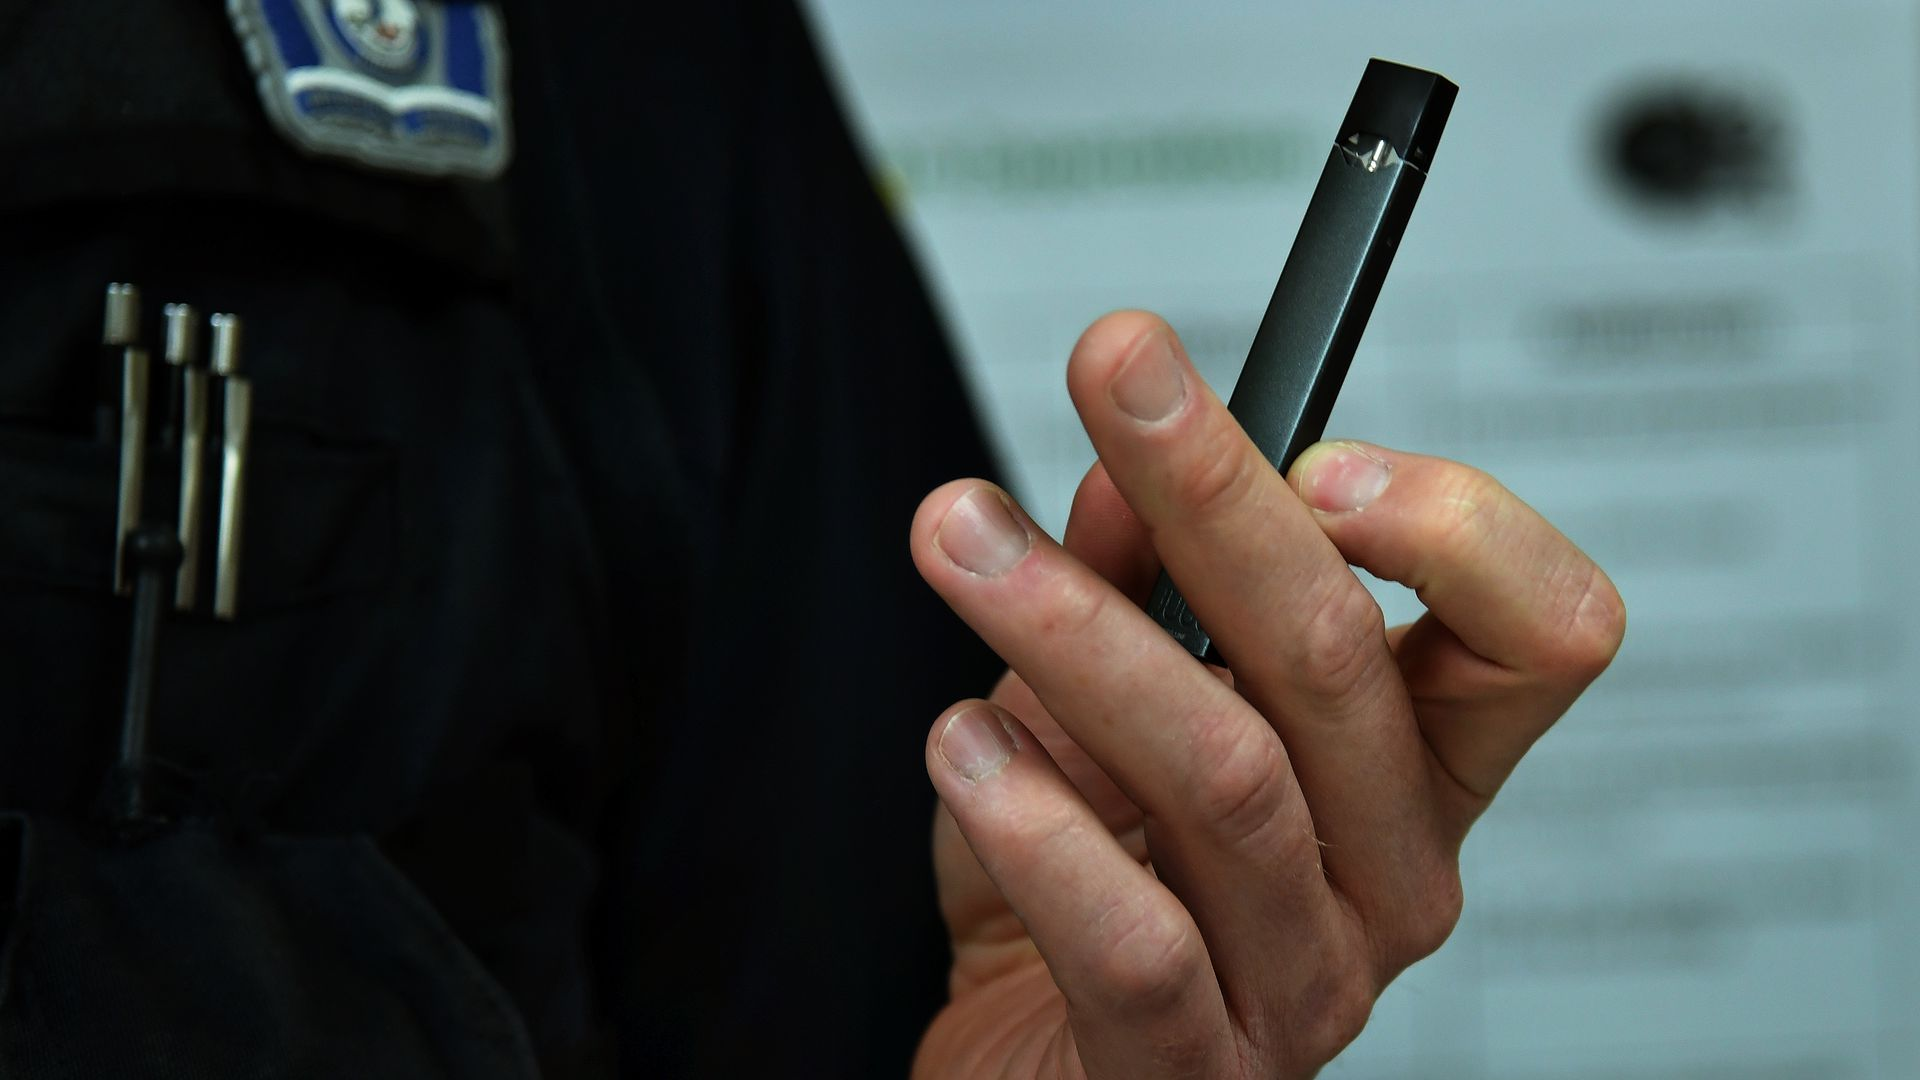 Man holding a juul e cigarette